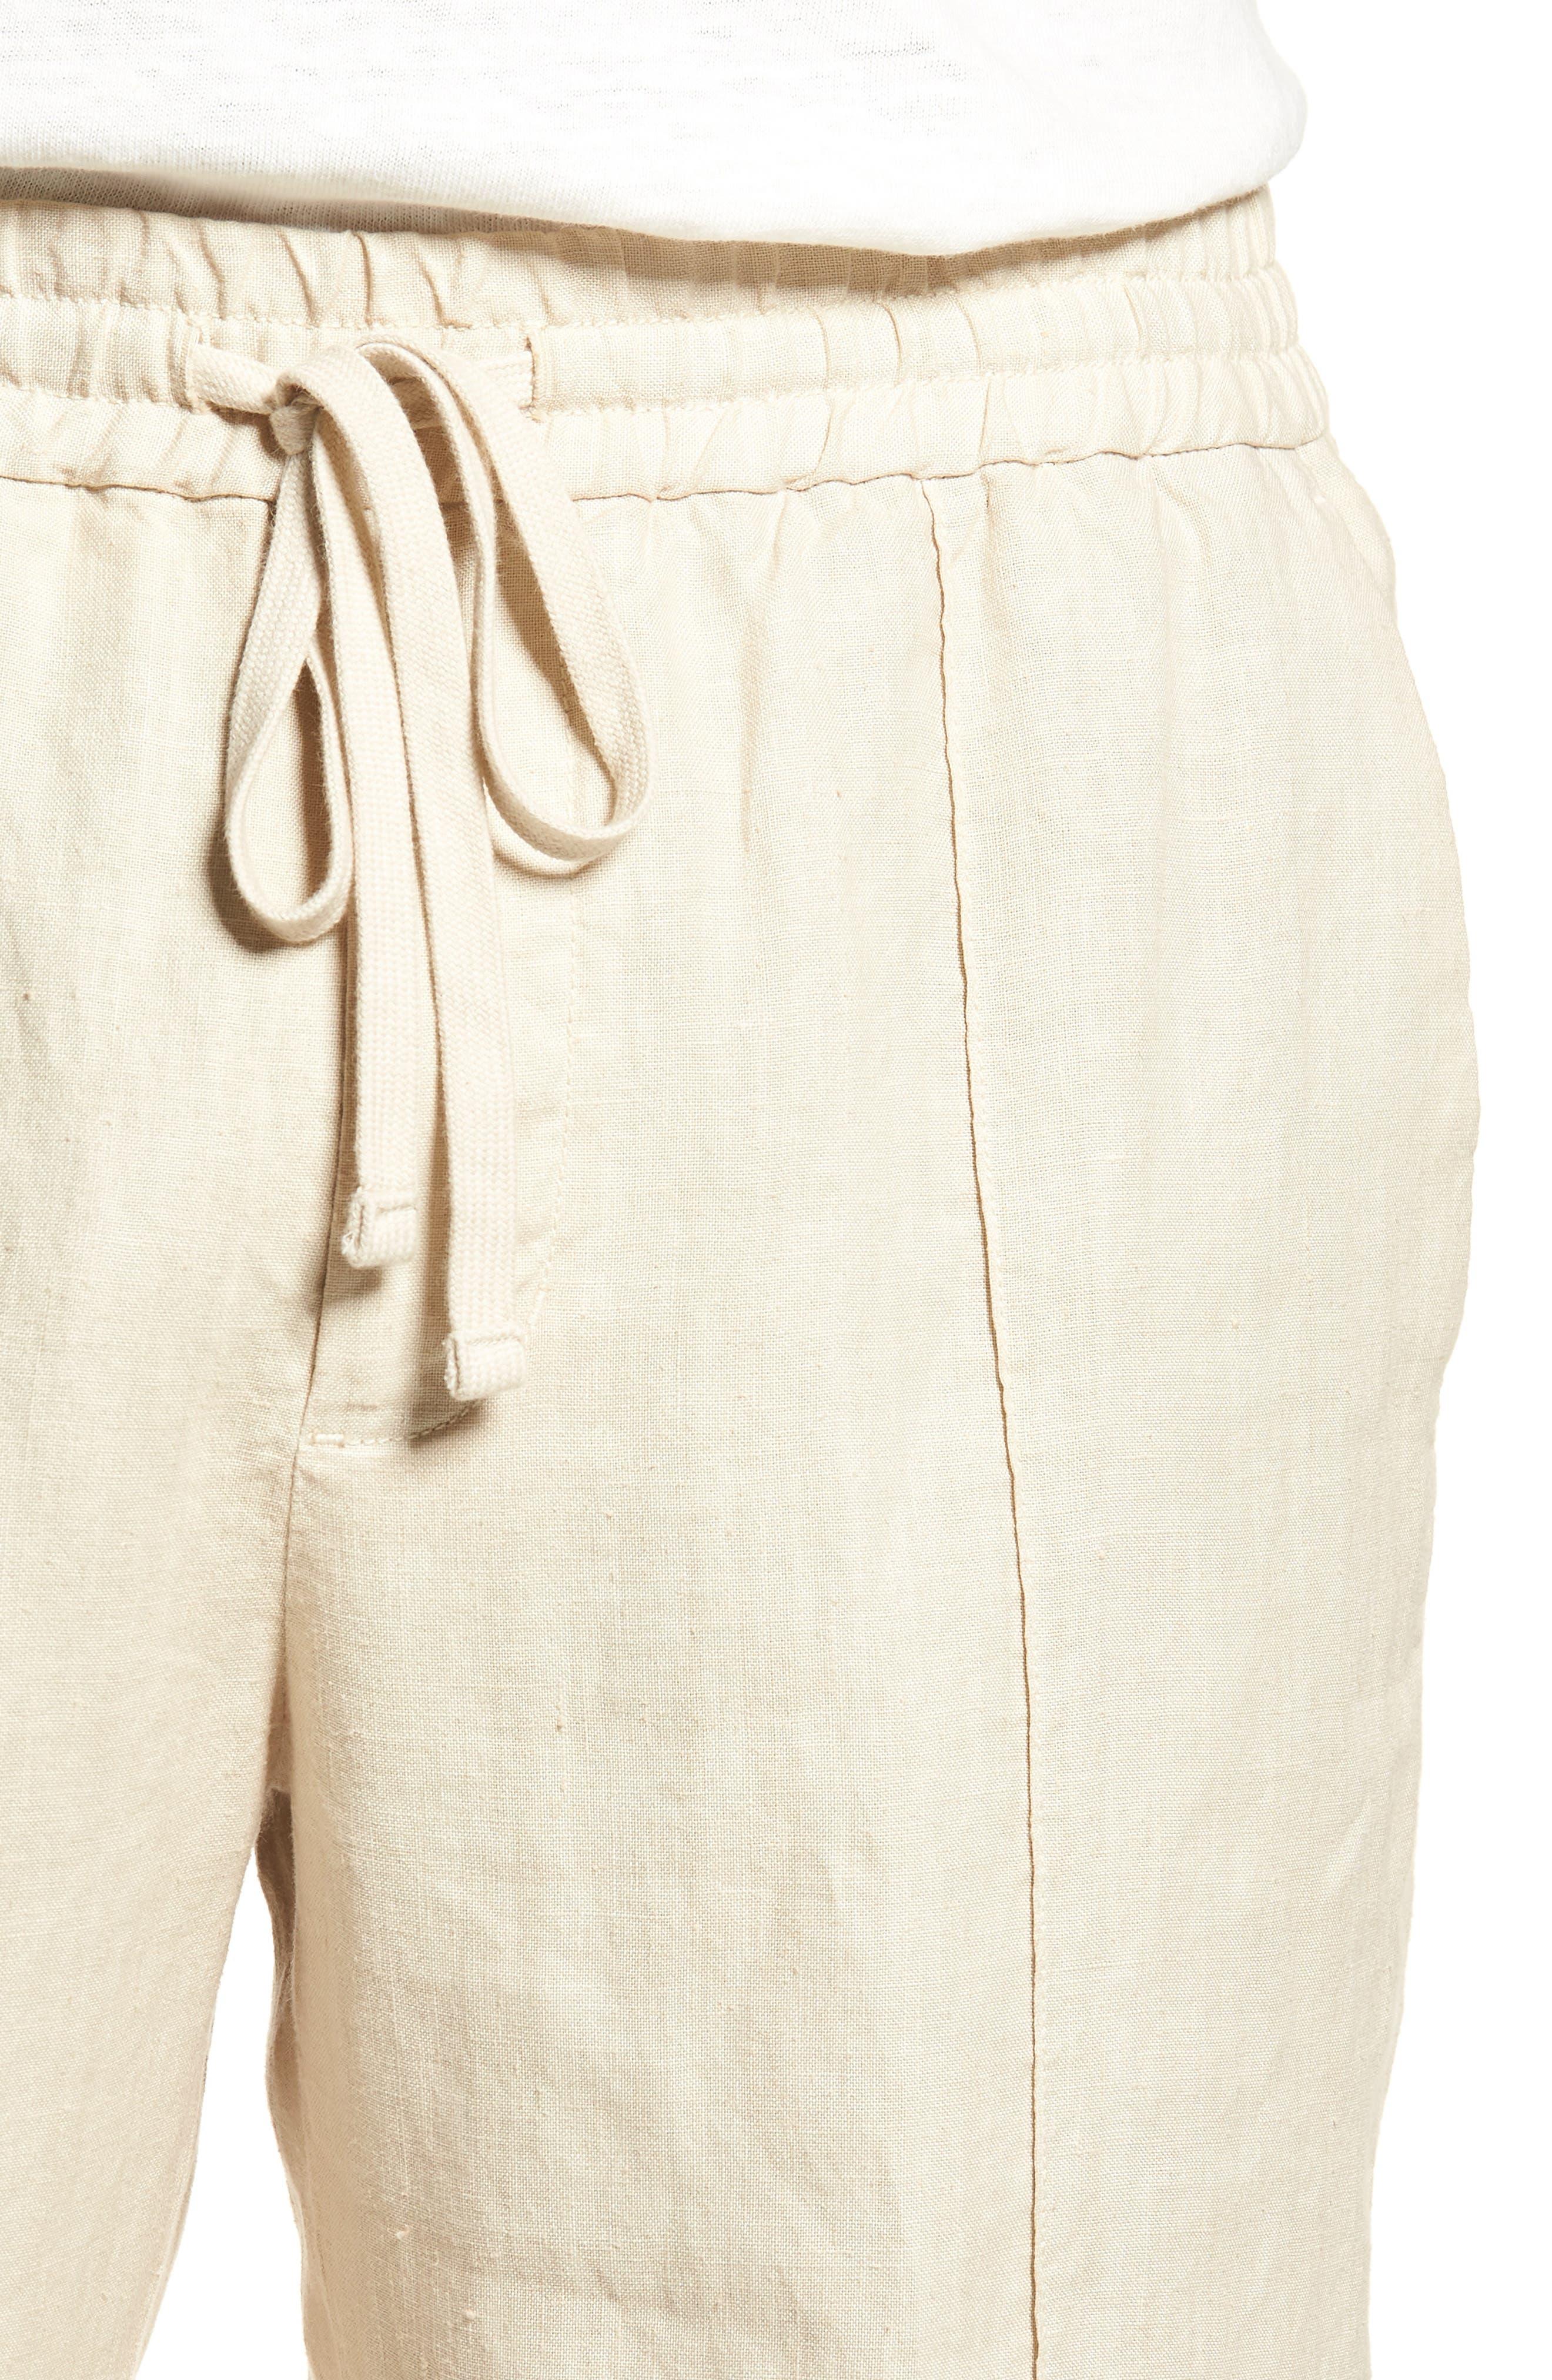 Pintuck Slim Fit Hemp Track Pants,                             Alternate thumbnail 4, color,                             250